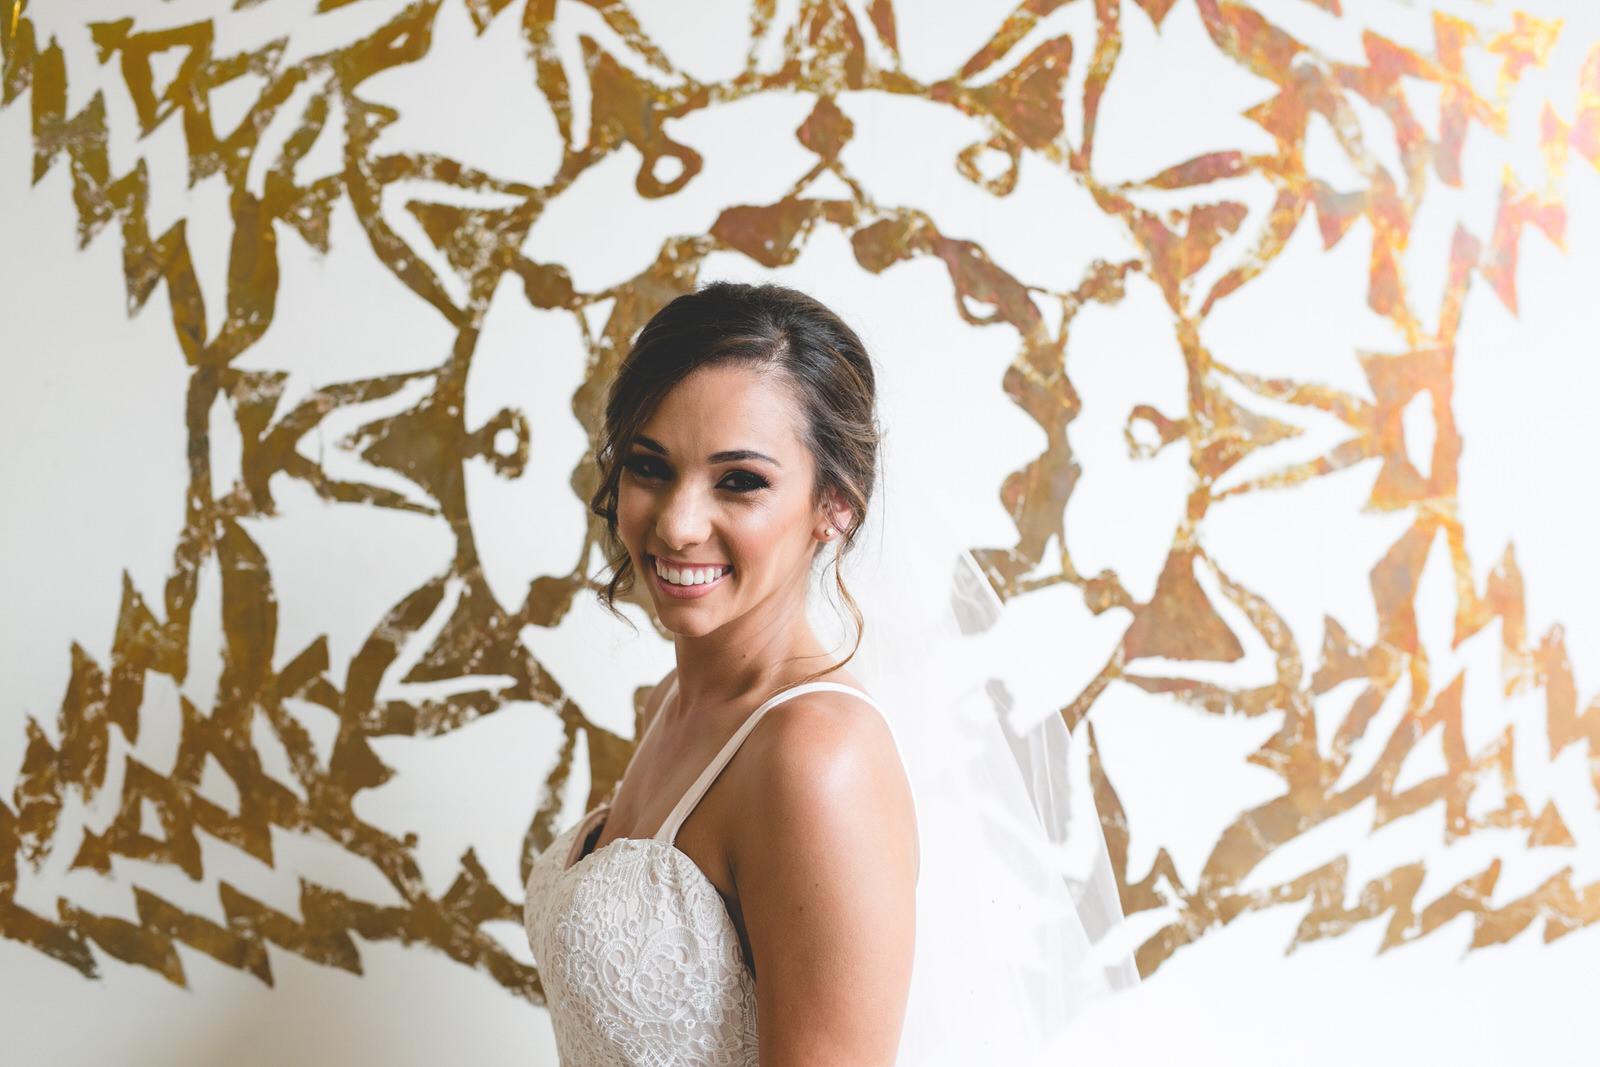 Bridal portrait at wall art in Kellys Hotel on Fade Street